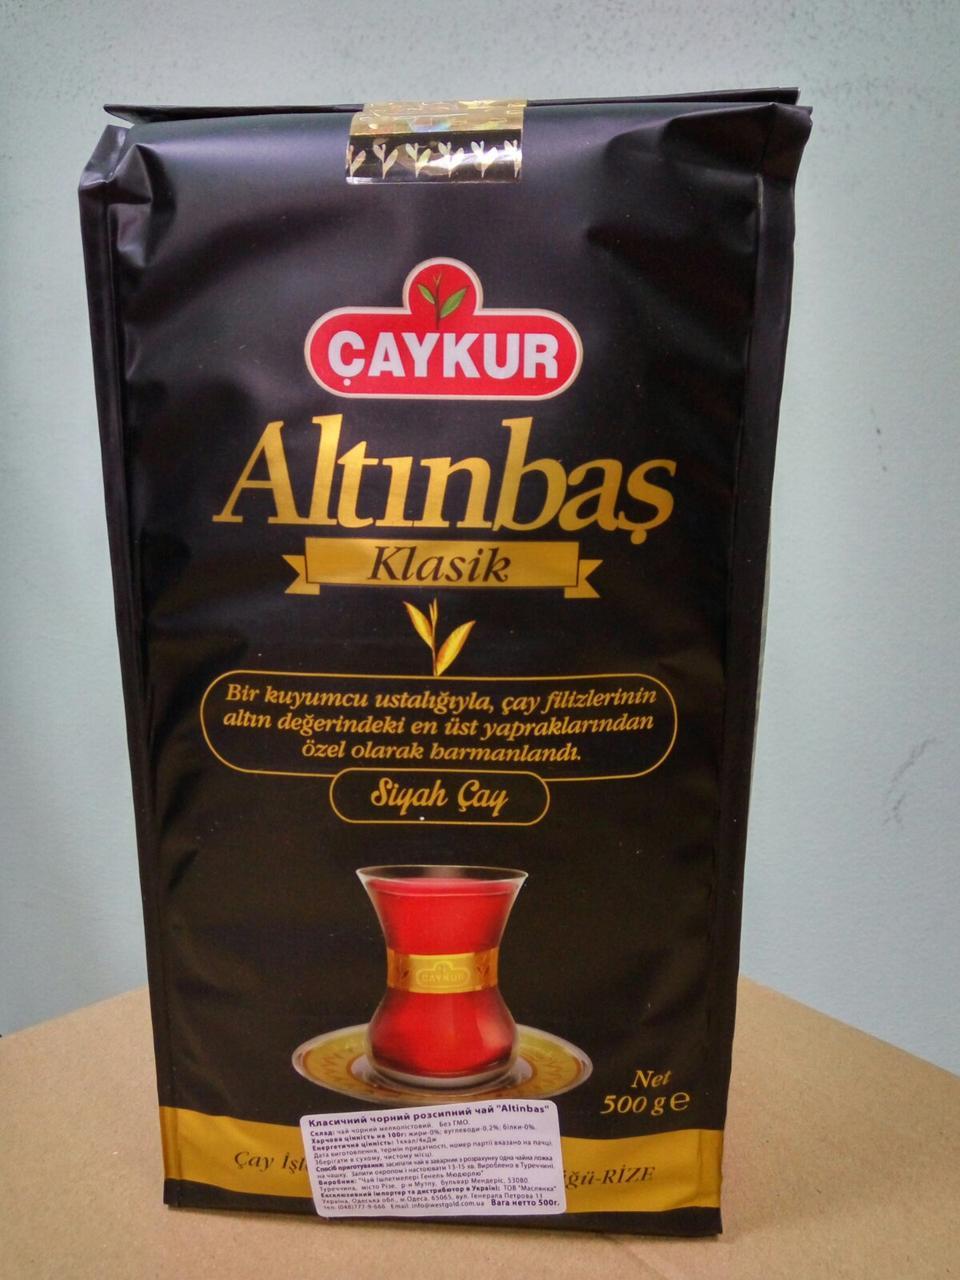 Чай черный турецкий Алтинбас (Altinbas Klasik), 500 г TM CAYKUR